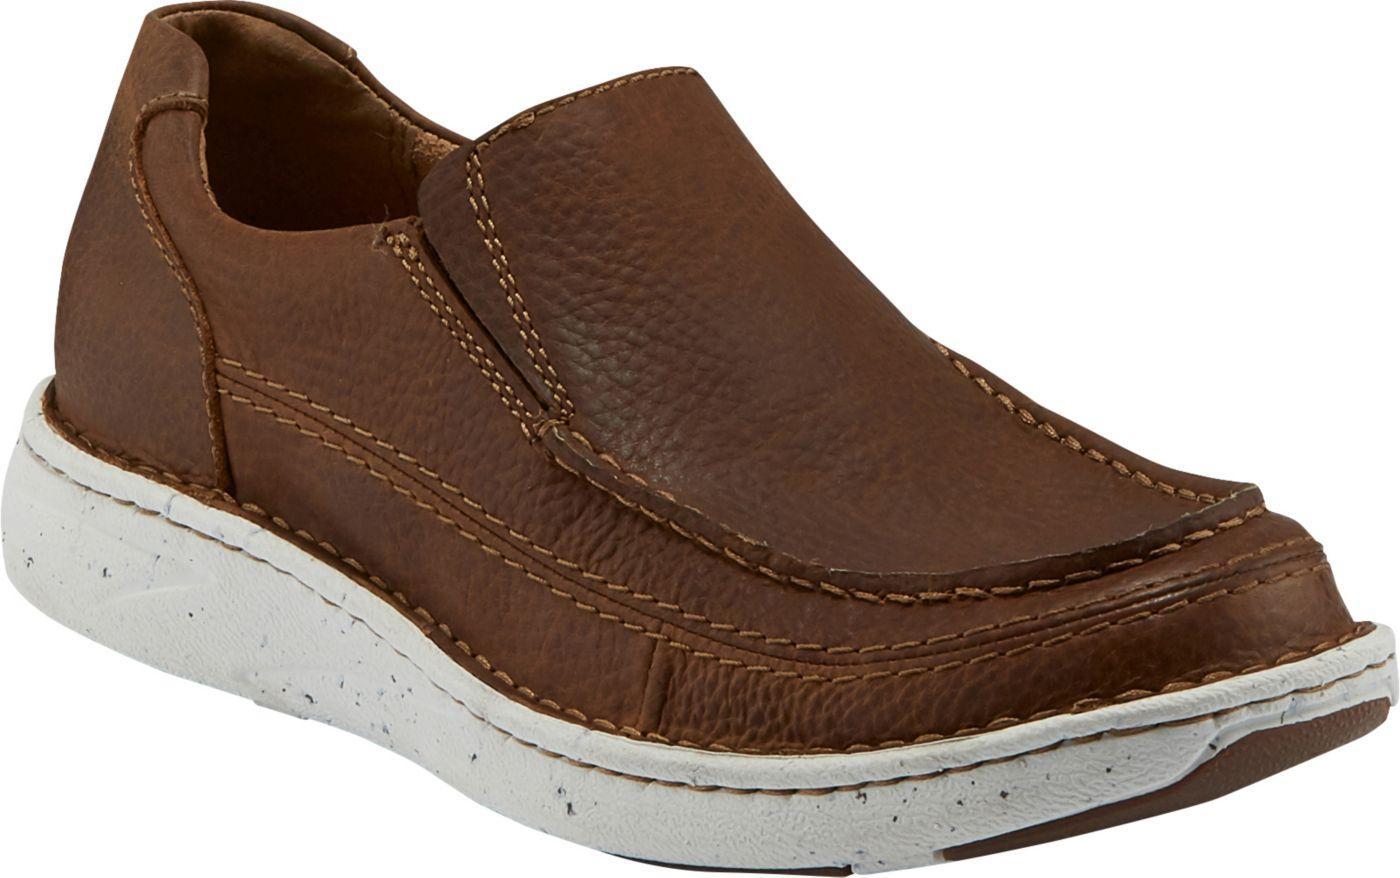 Justin Men's Looper Casual Shoes